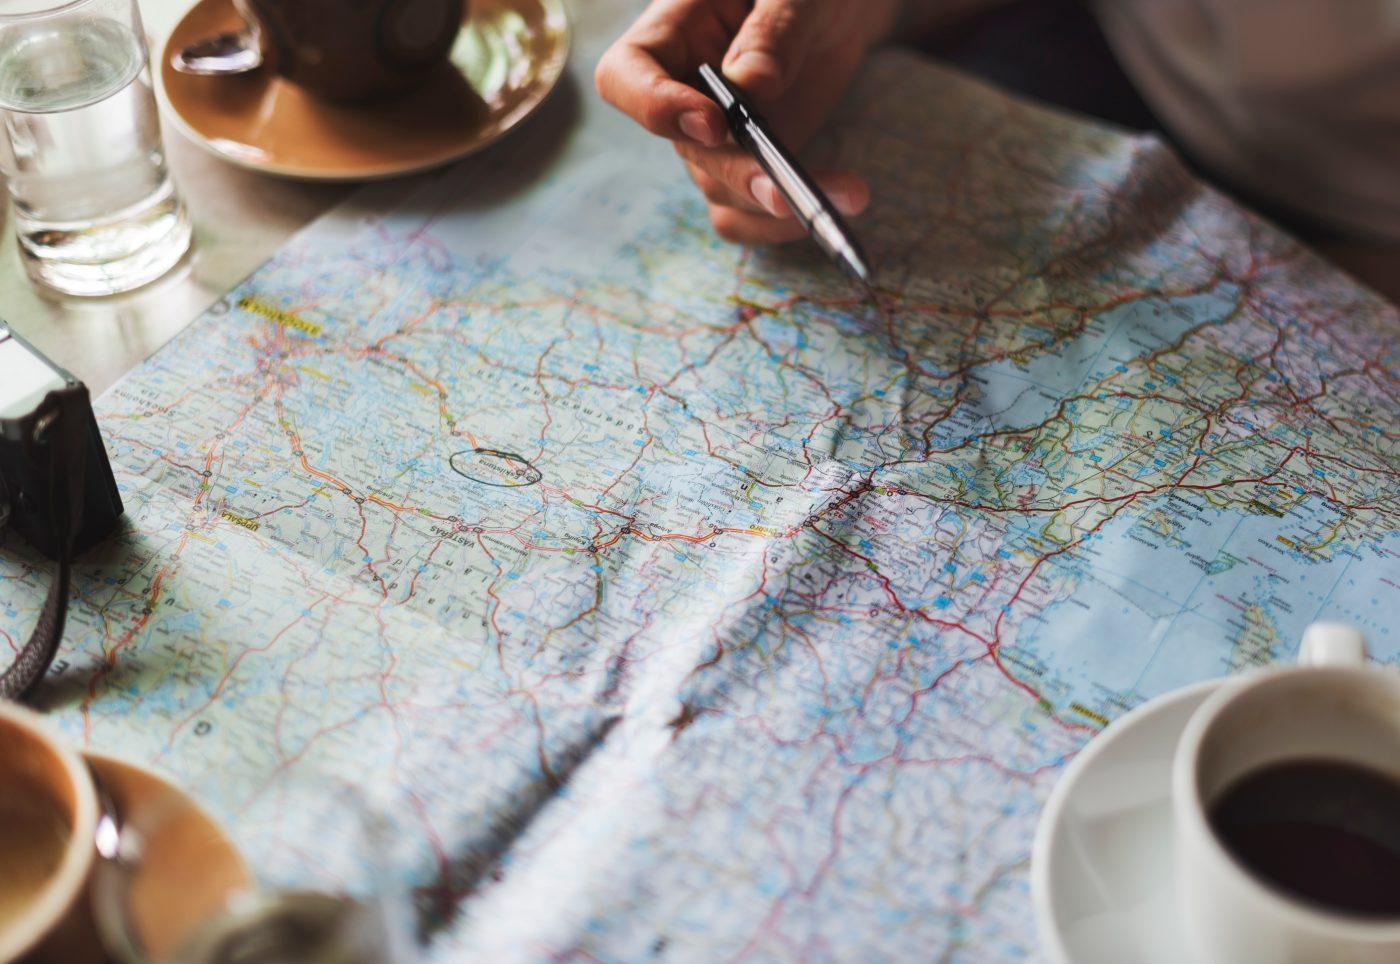 Minimalism: Adventure